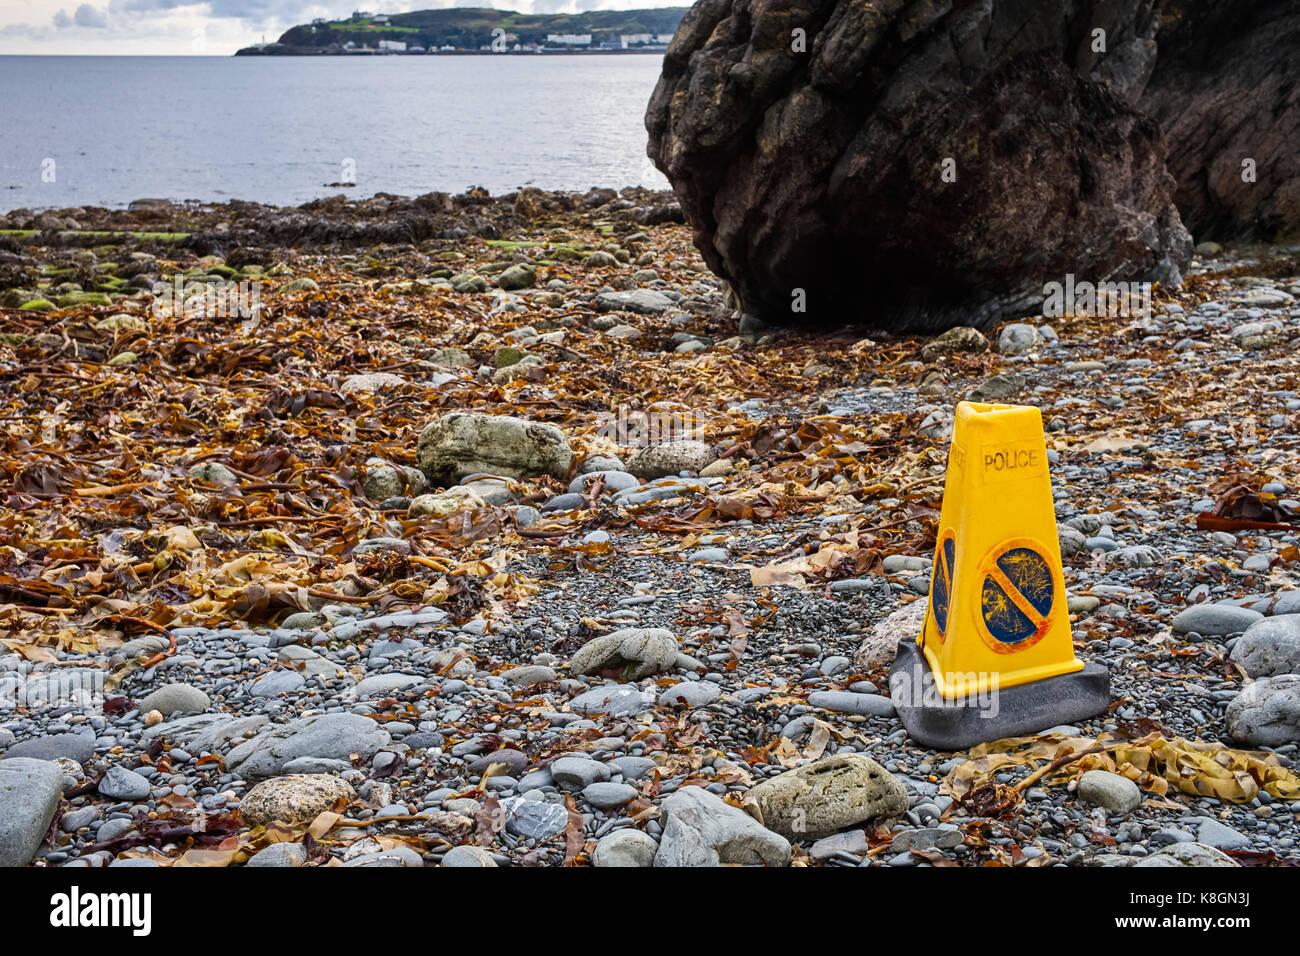 Plastic no waiting cone on beach in Douglas, Isle of Man - Stock Image